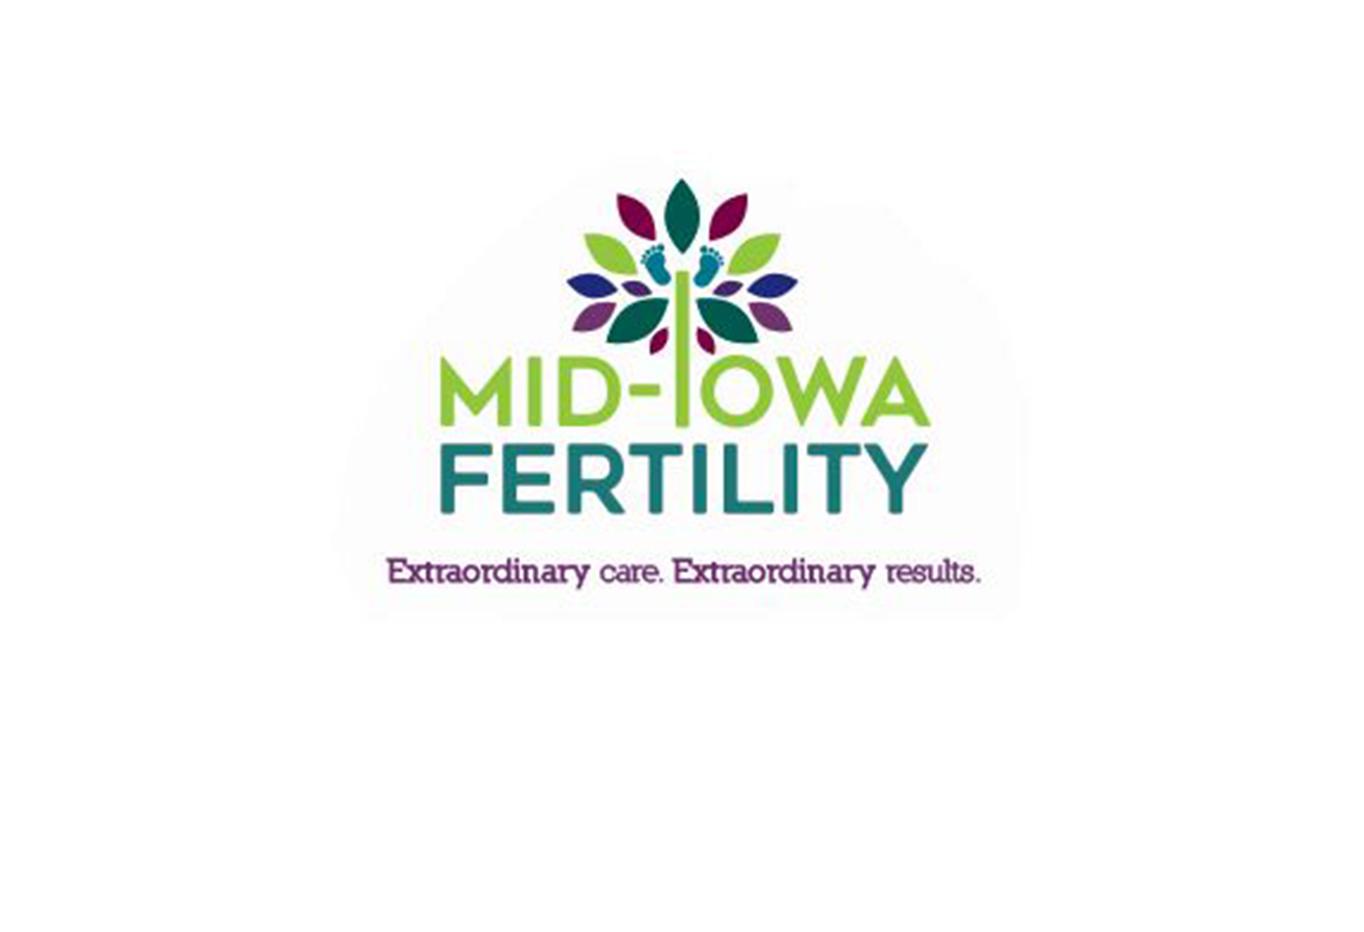 MidIowaFertilityGold.png